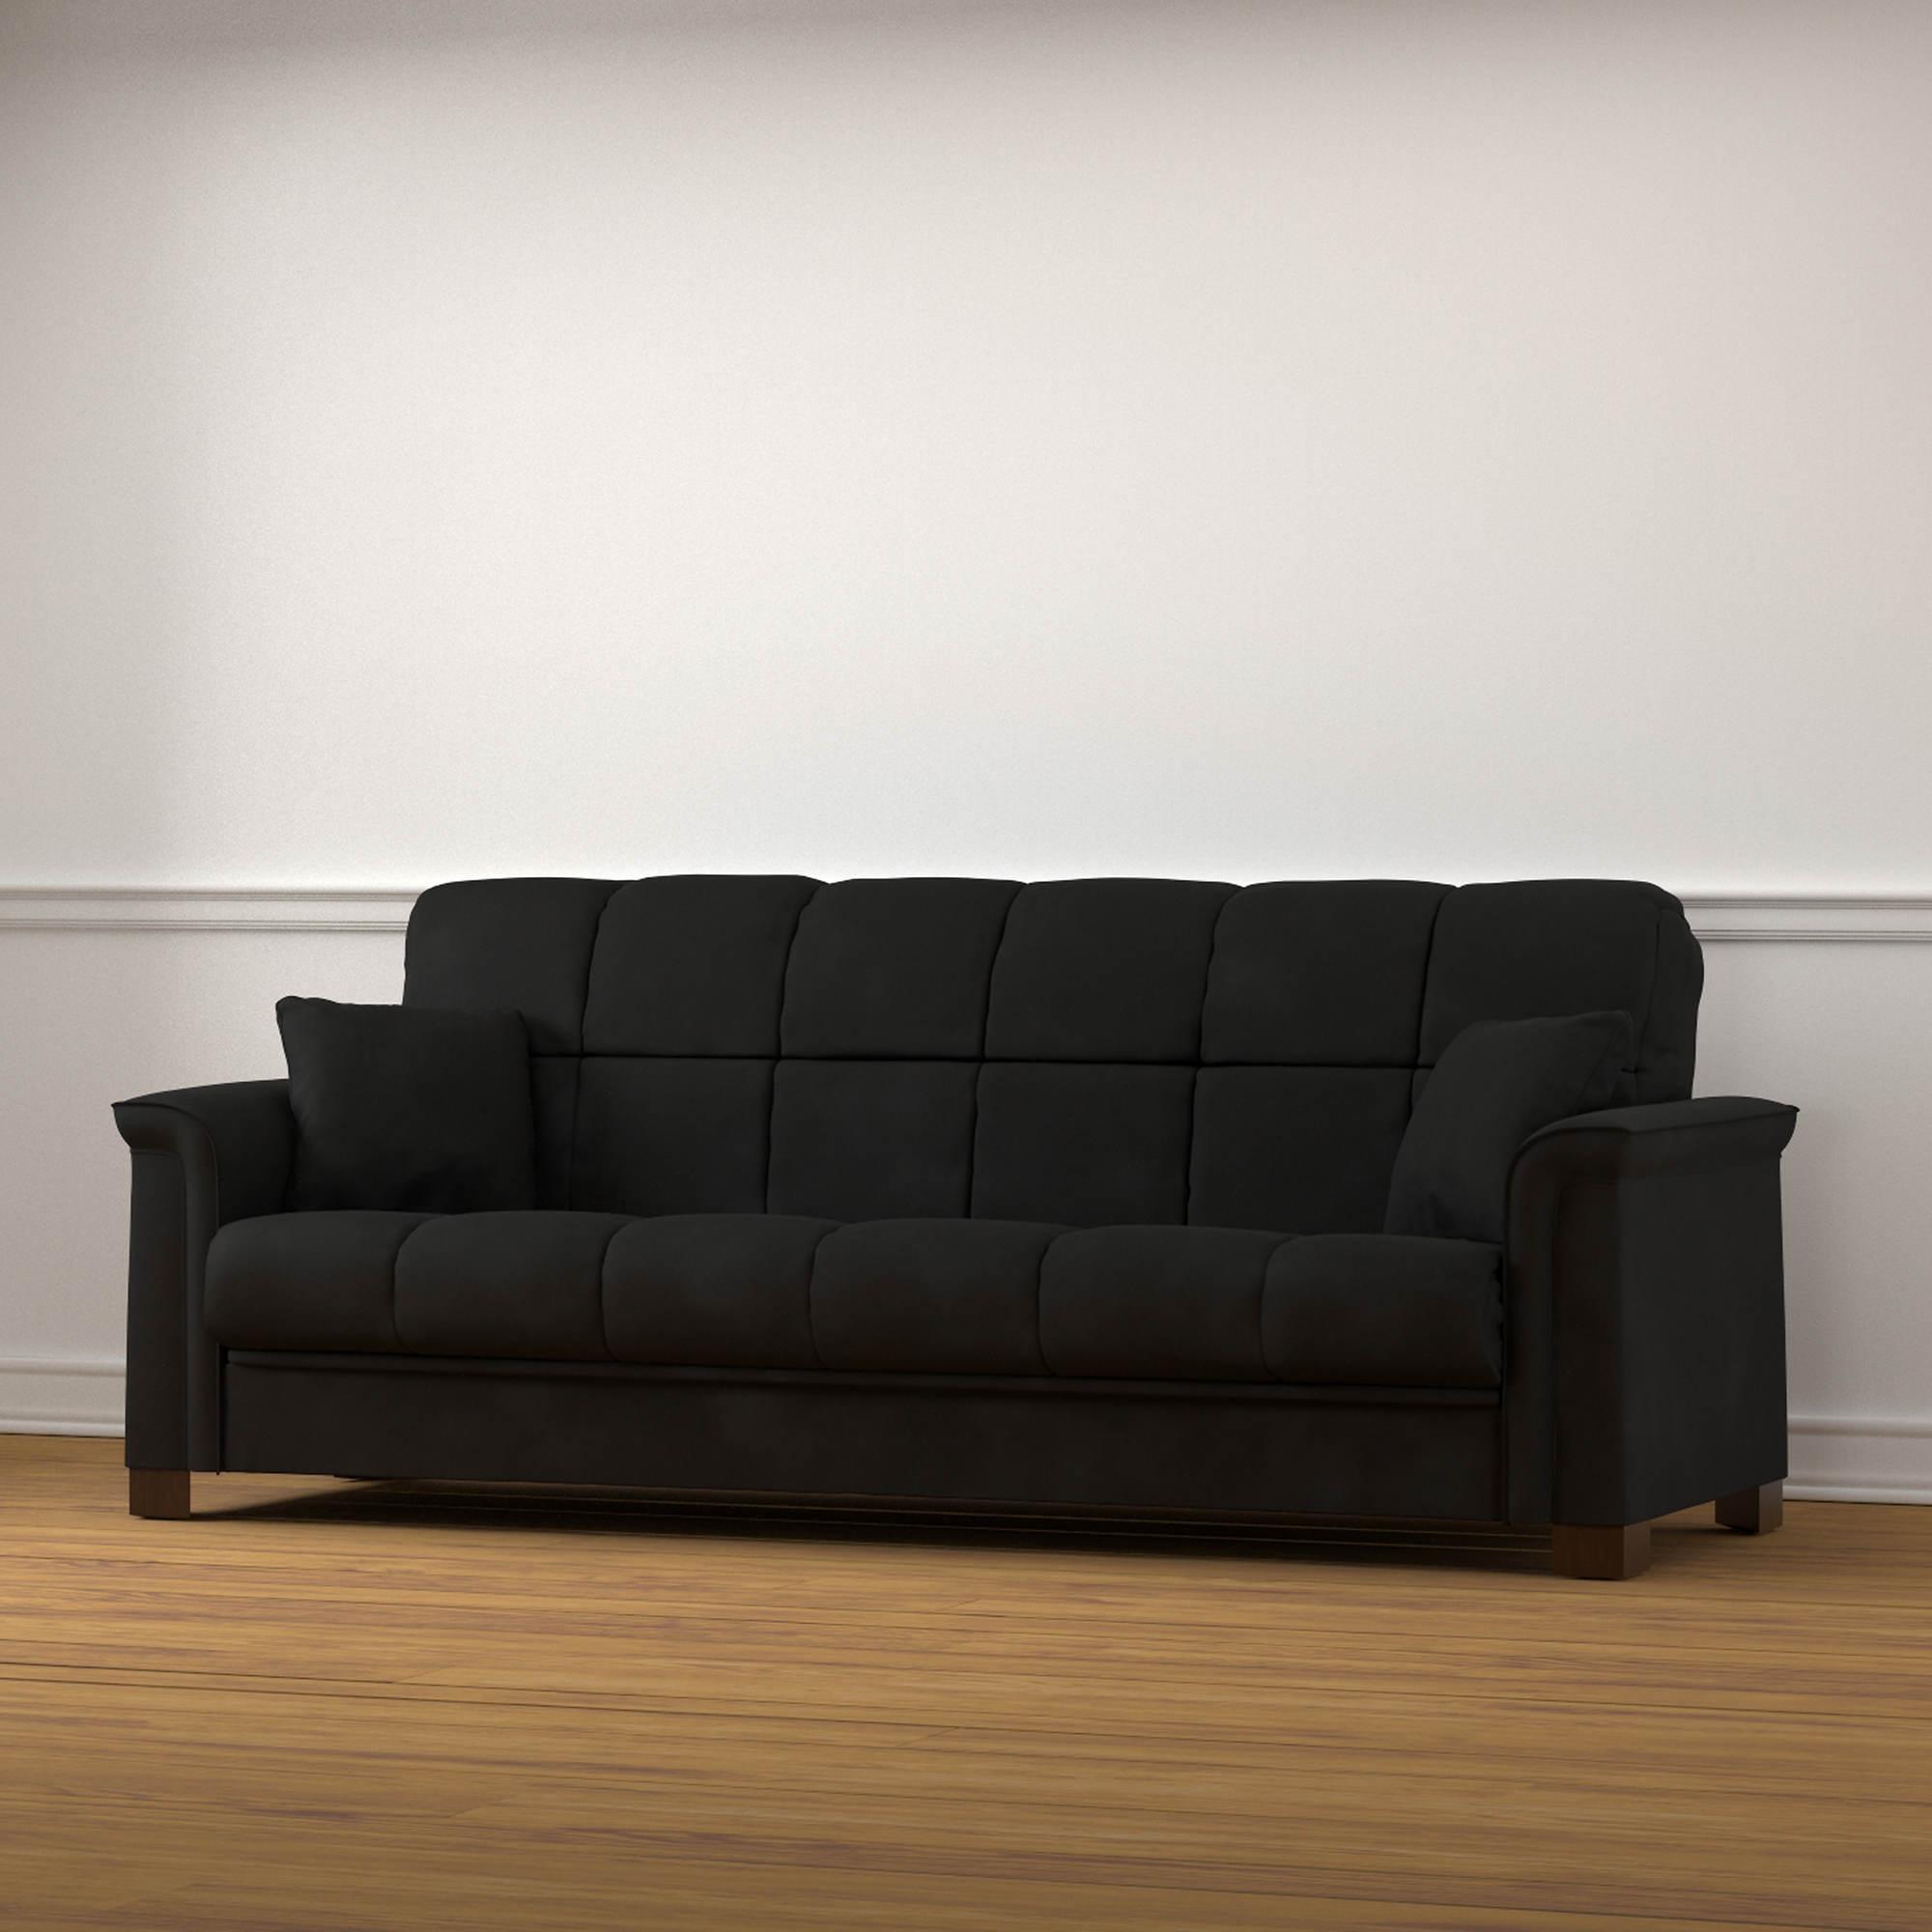 Handy Living Caroline Convert-A-Couch Sleeper Sofa - Black ...